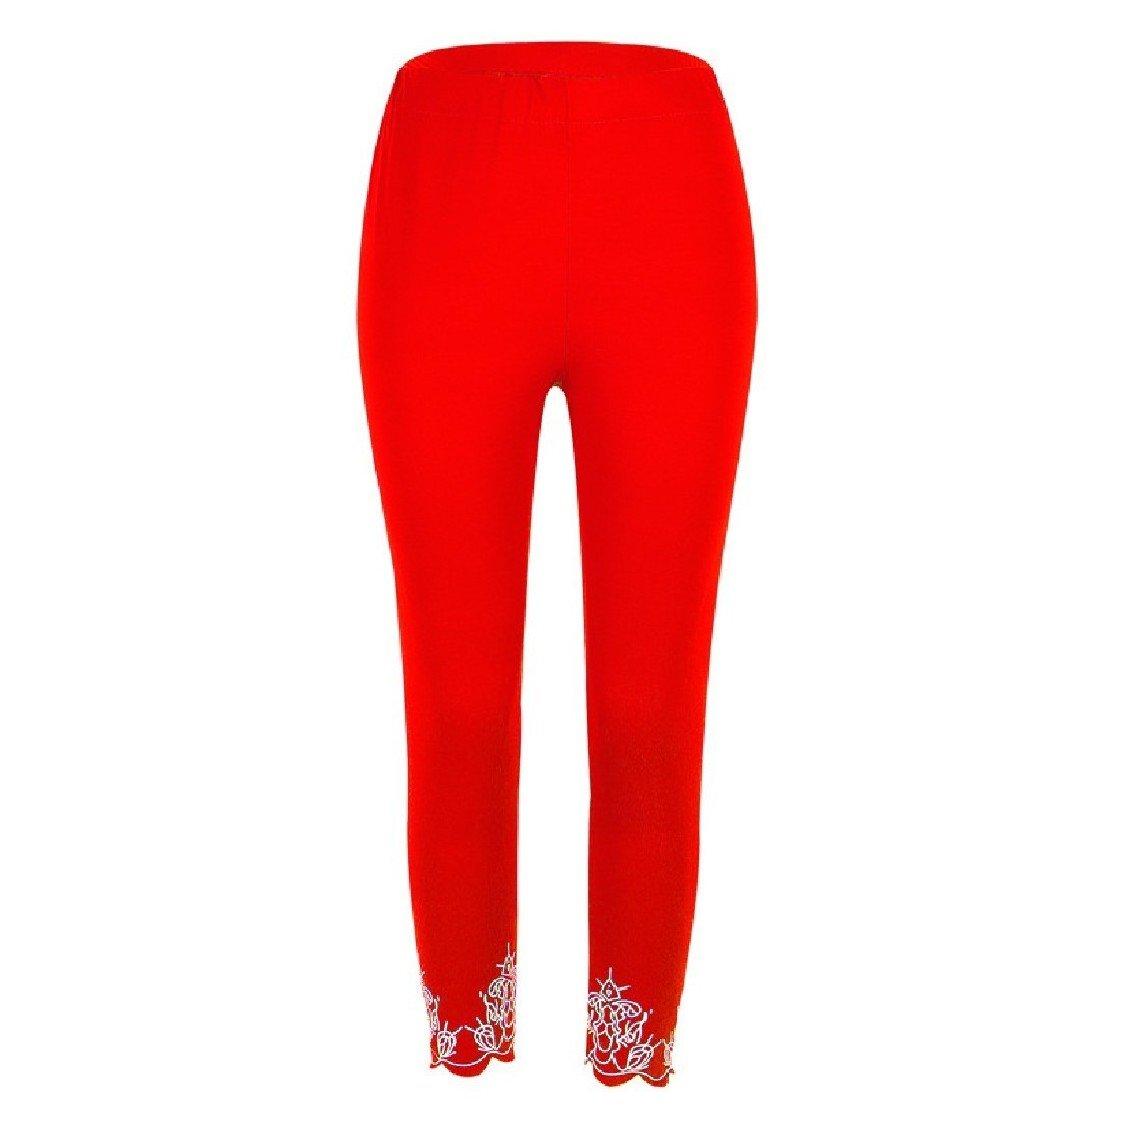 Fieer Women's Solid-Colored Oversized Floral Printed Slim Yoga Capri Legging